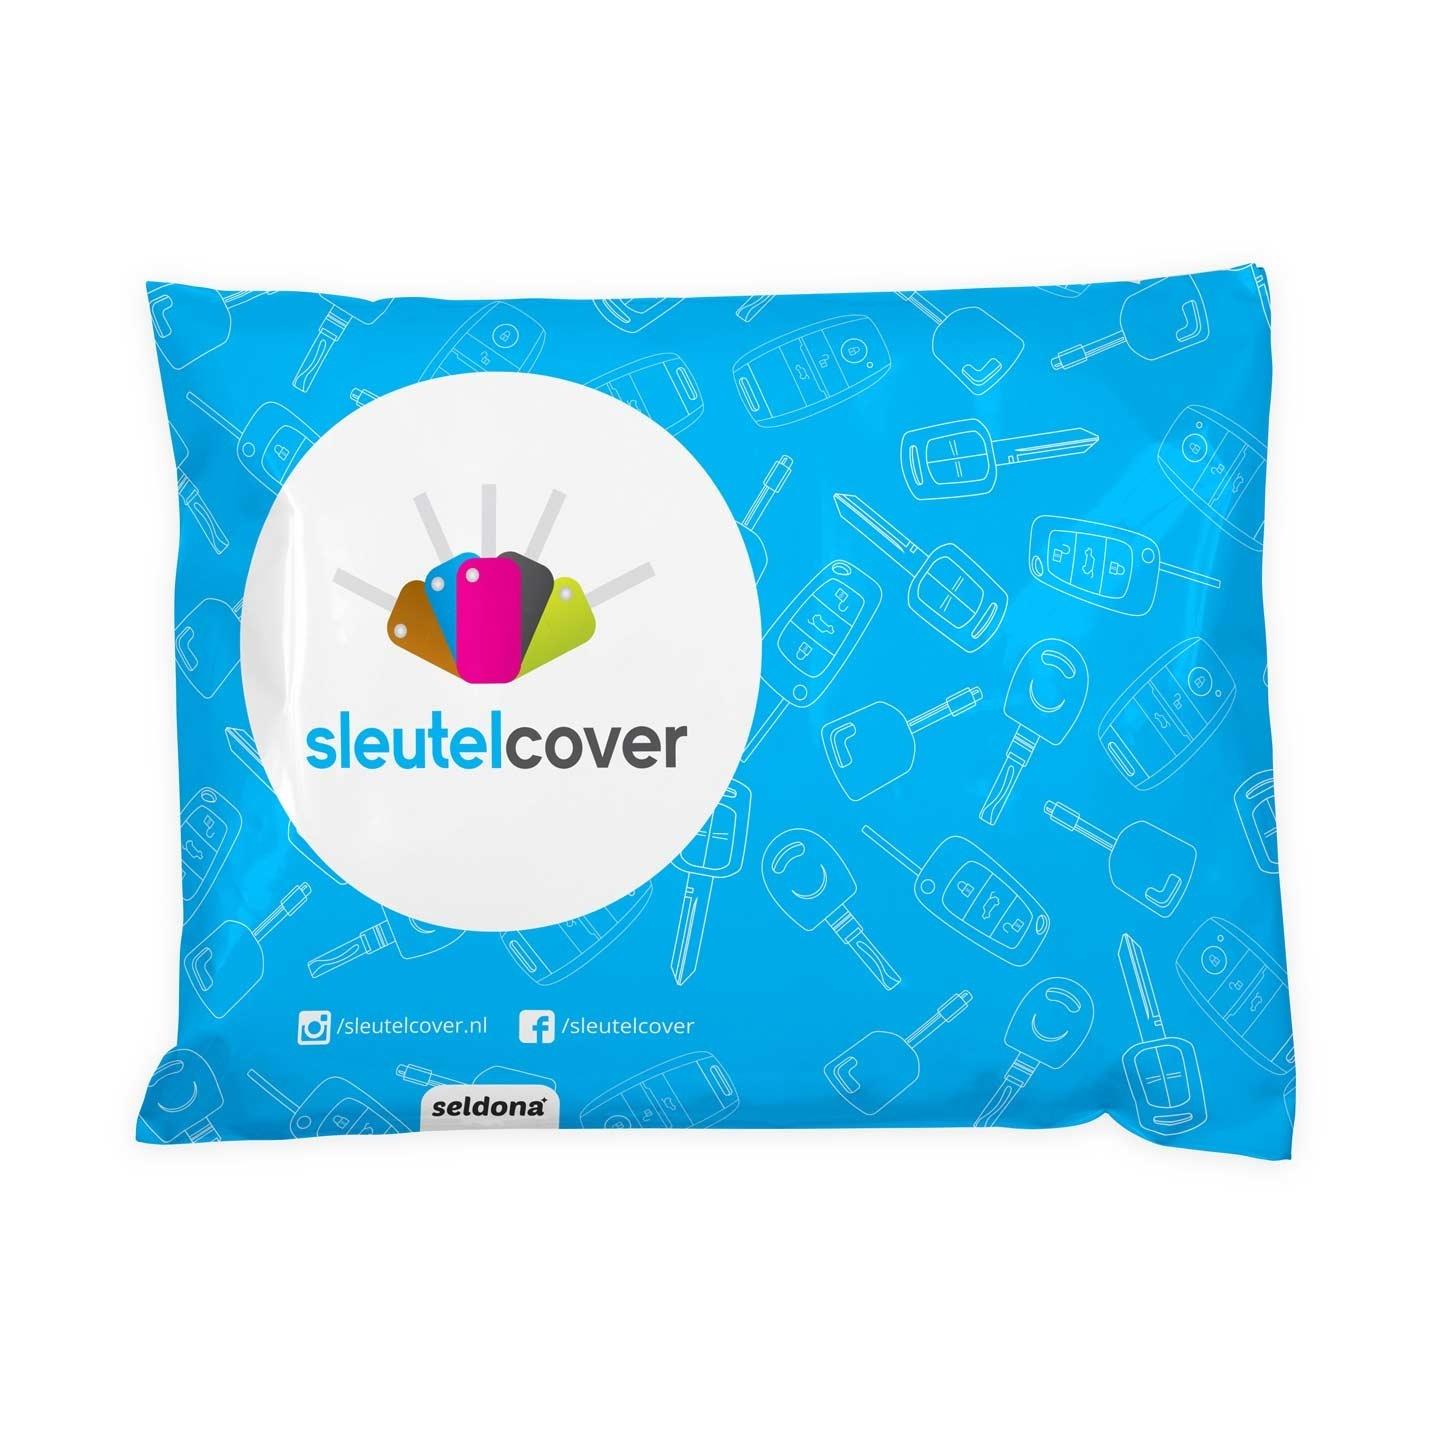 Mini SleutelCover - Wit / Silicone sleutelhoesje / beschermhoesje autosleutel